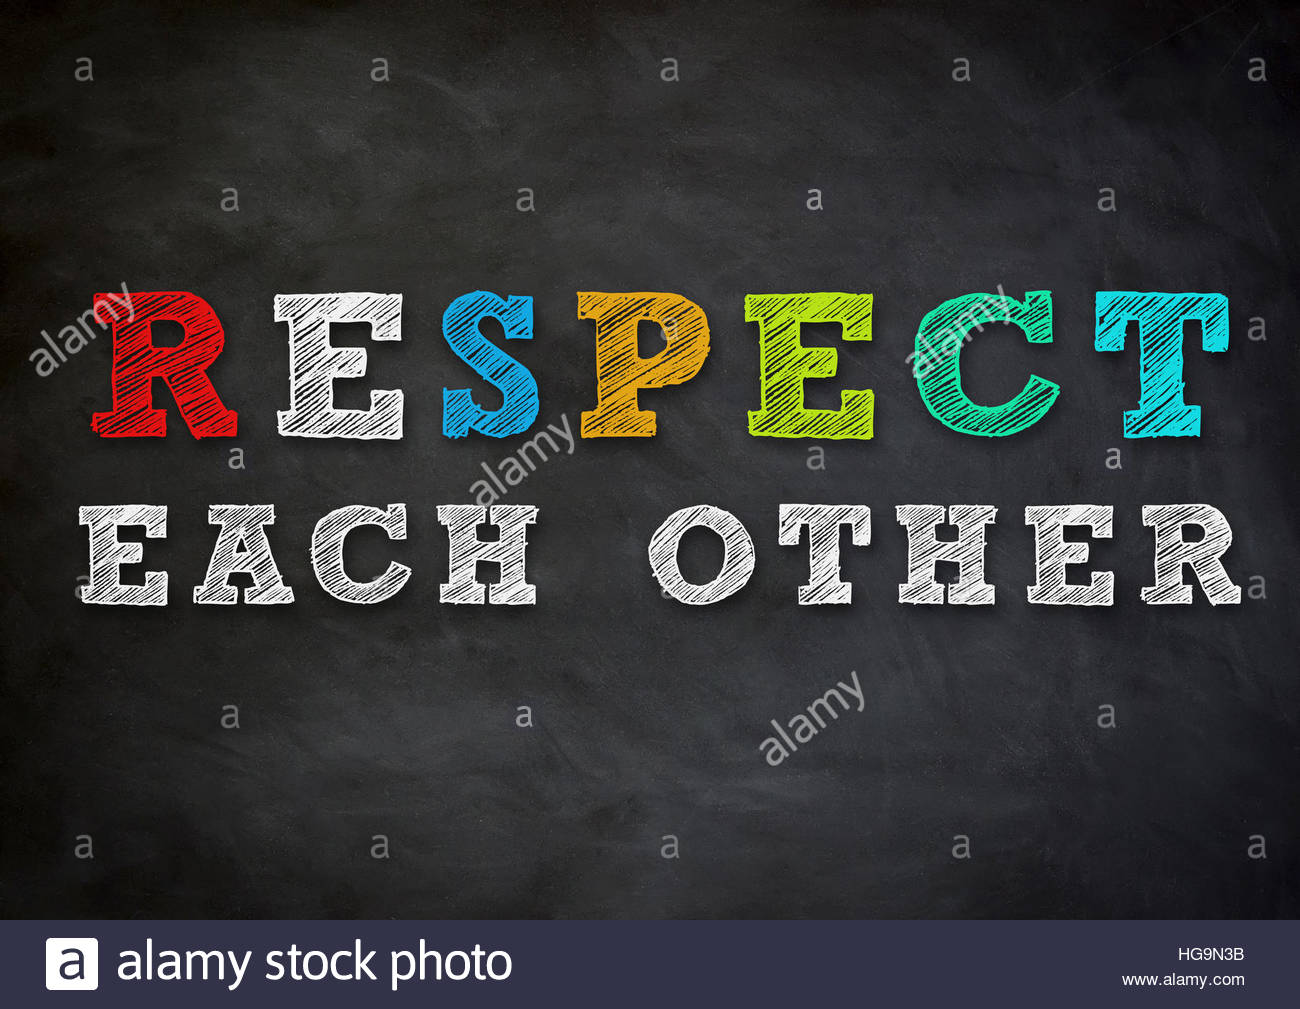 Respetar mutuamente Imagen De Stock